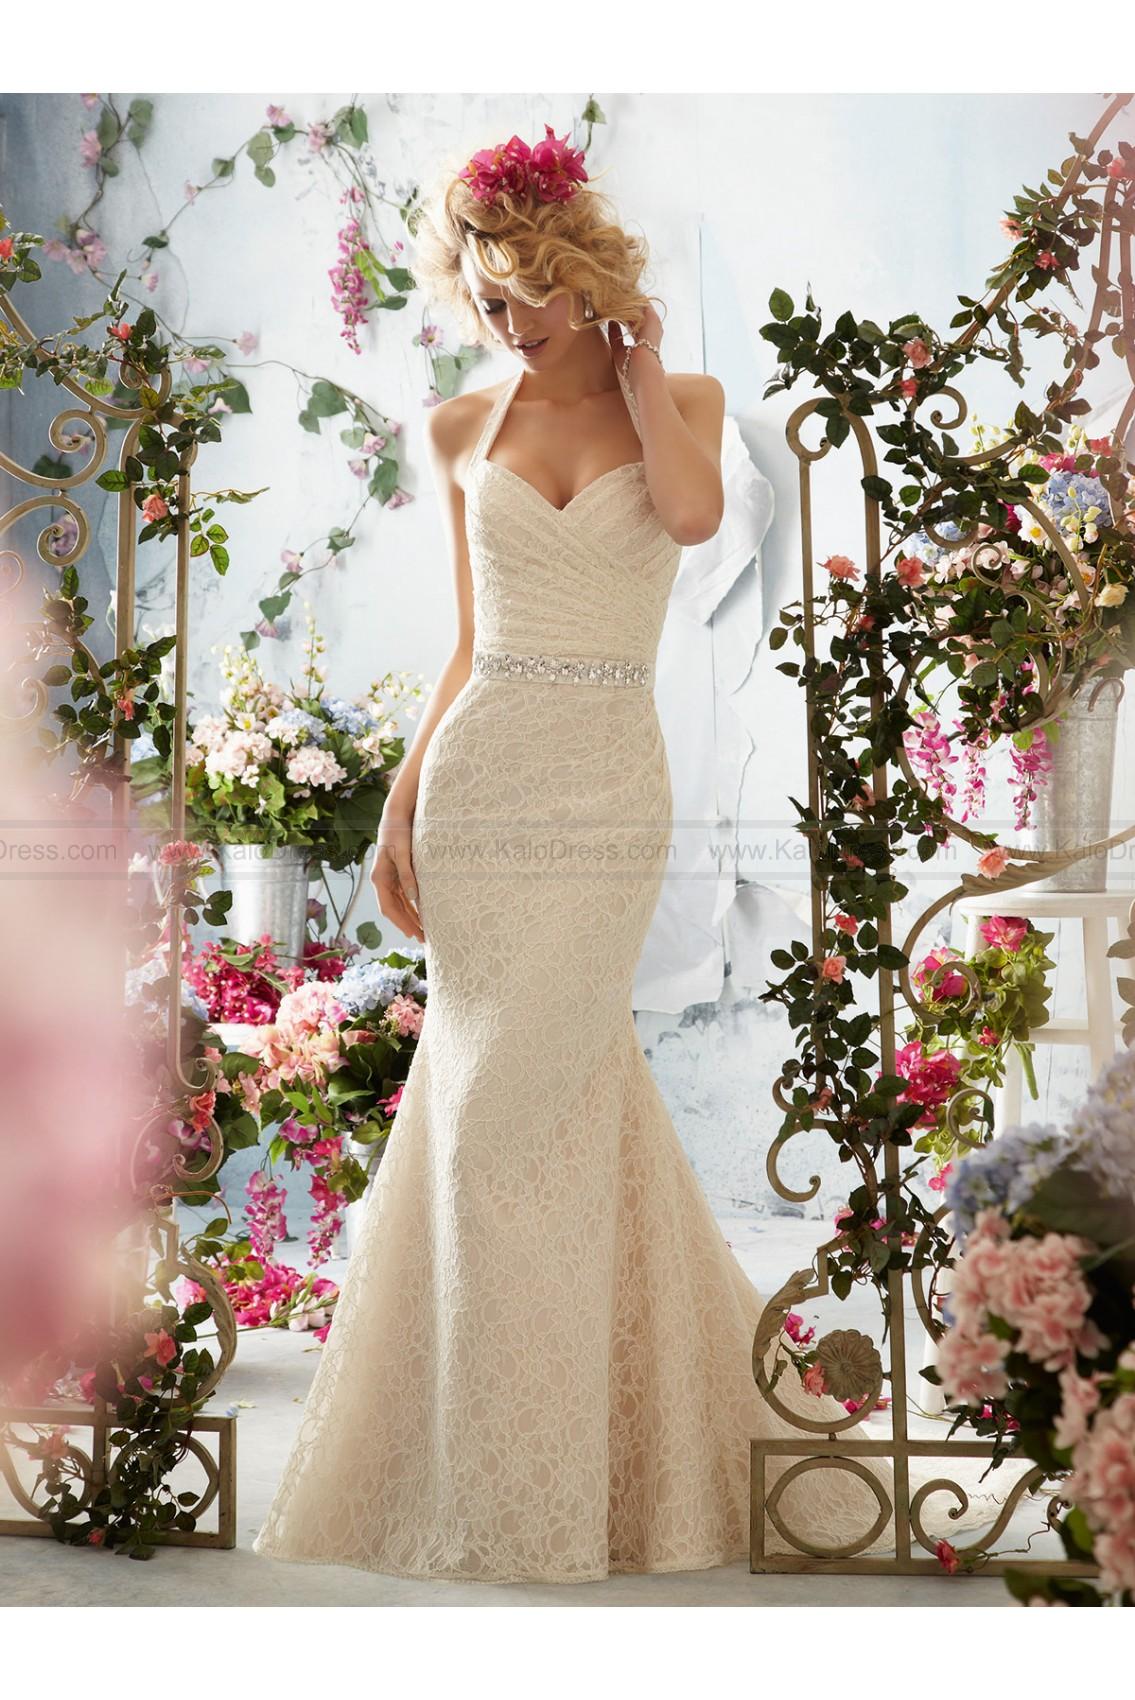 Fitted Floor Length Mermaid Style Bridal Dress By Mori Lee 6761 - Wedding Dresses 2014 New - Formal Wedding Dresses